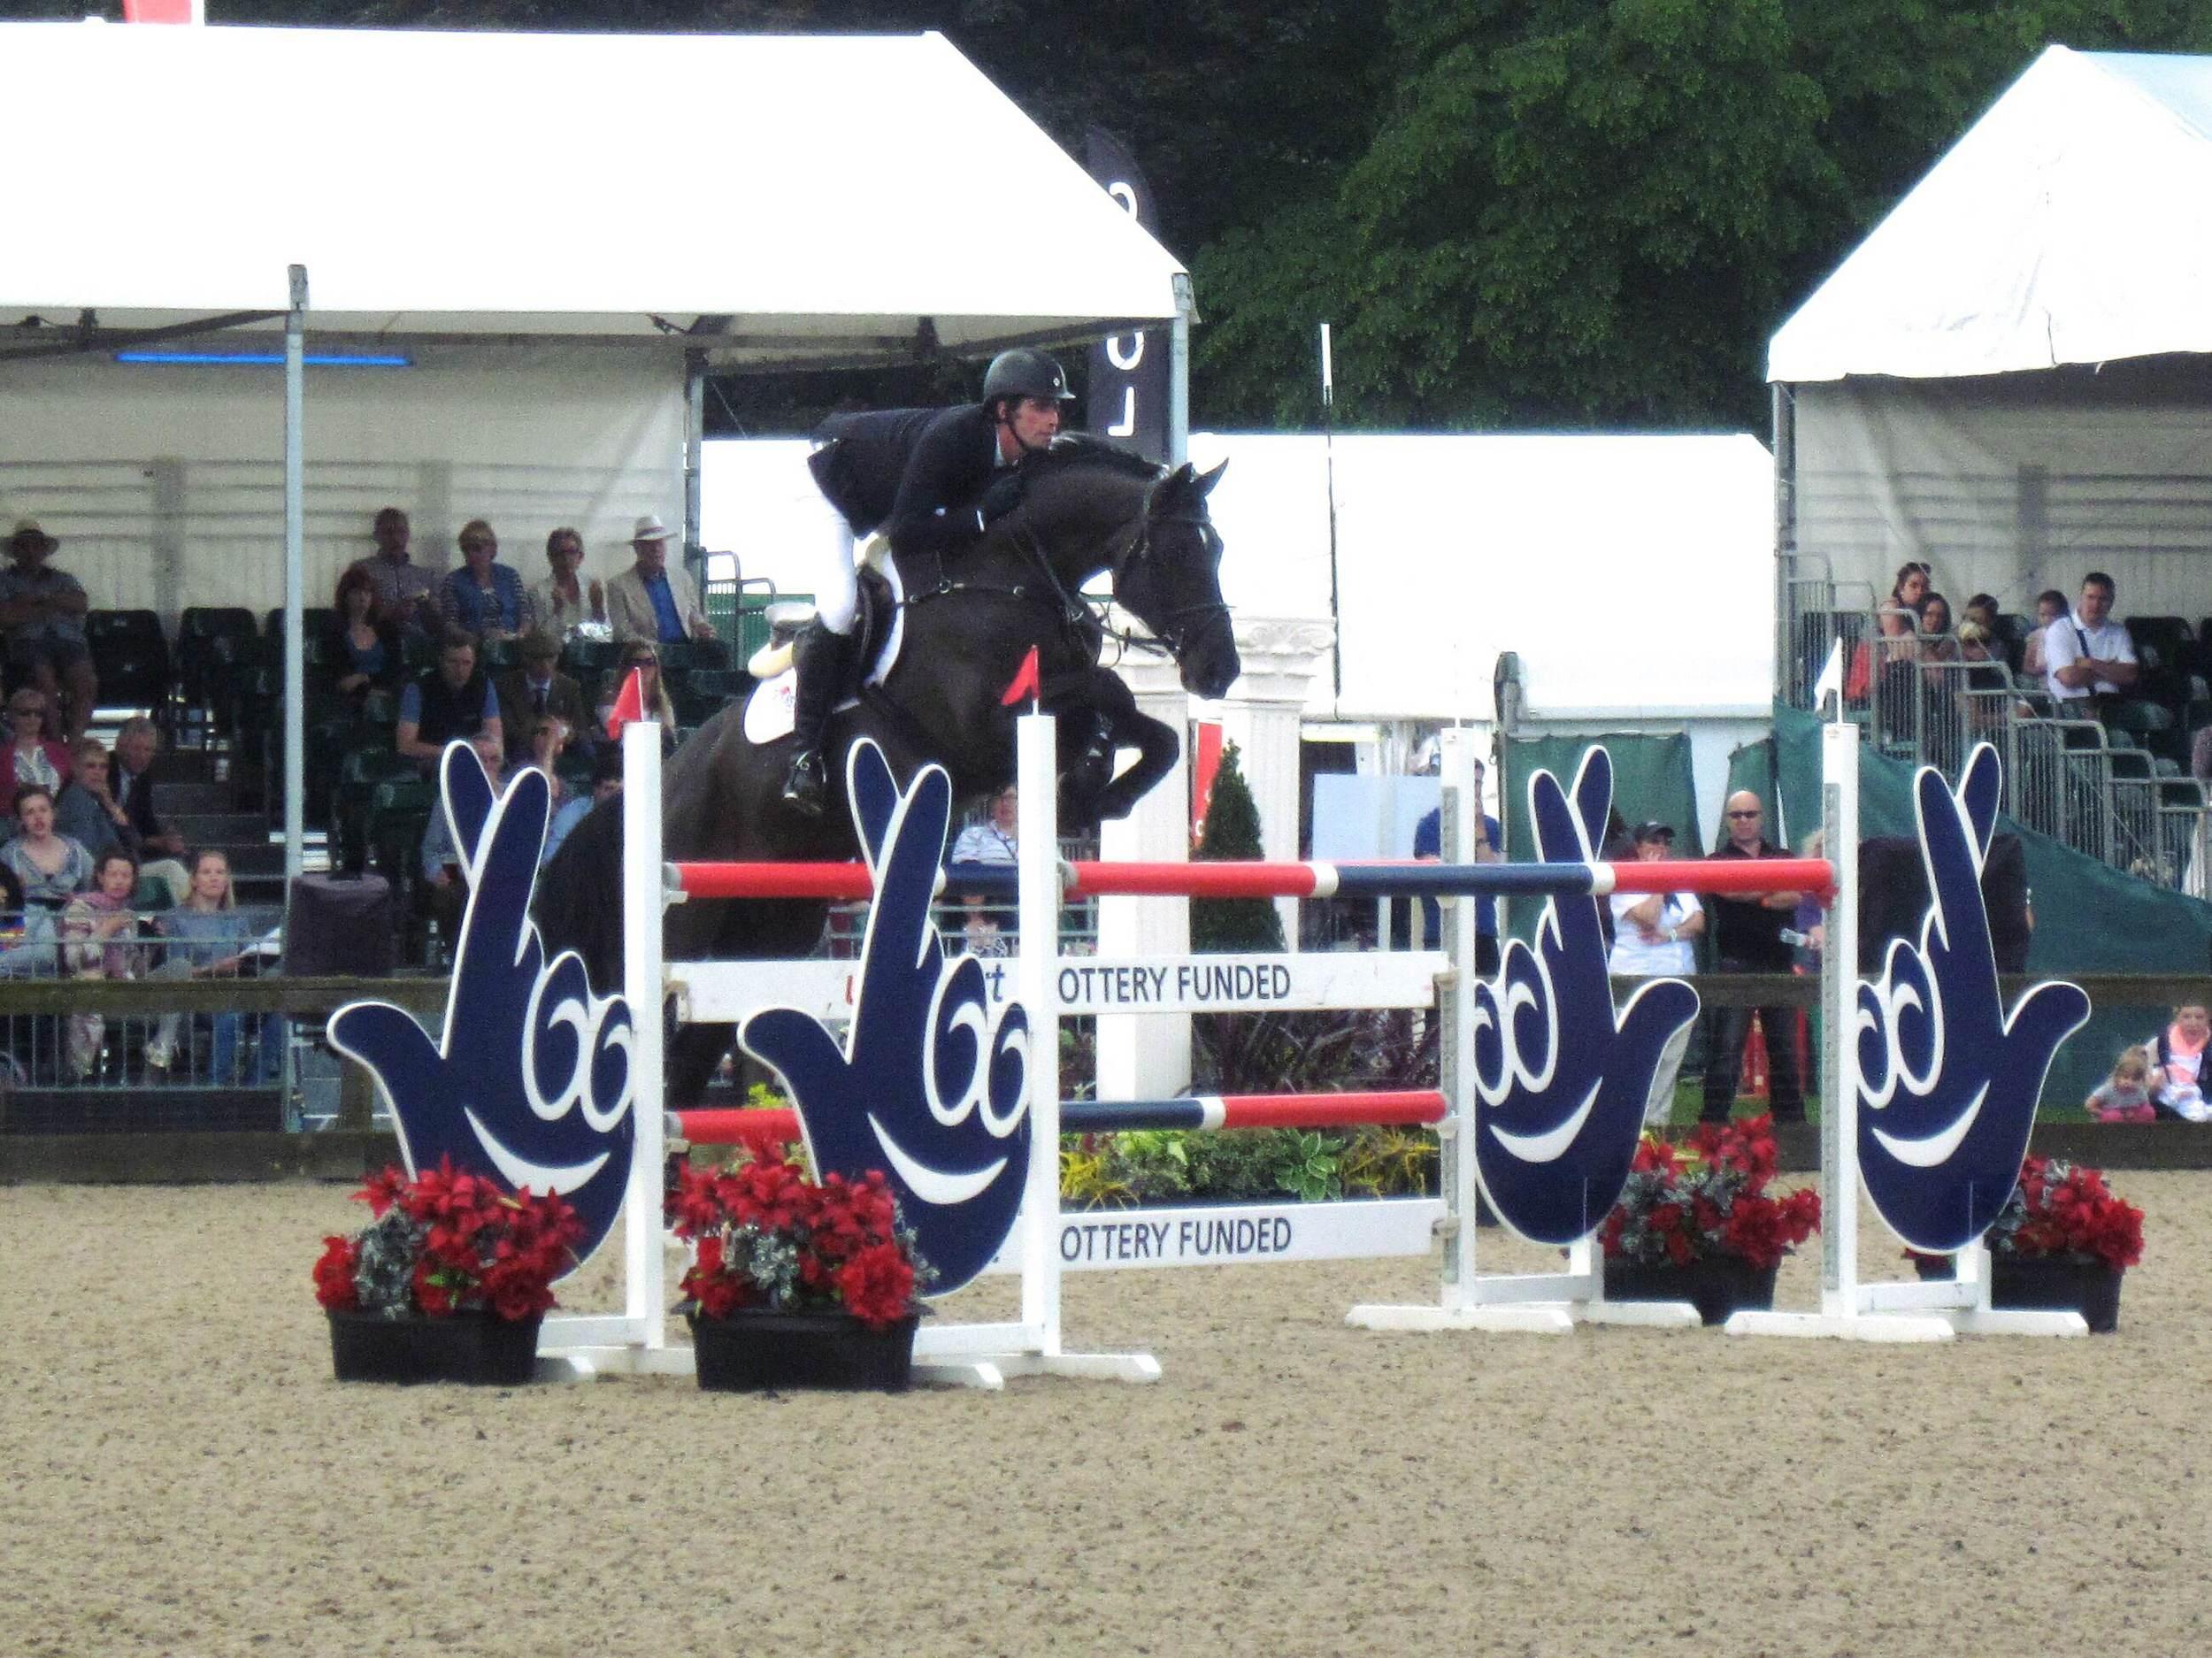 Arantos Ladies & Gentlemens 1.50 Royal Windsor Horse Show